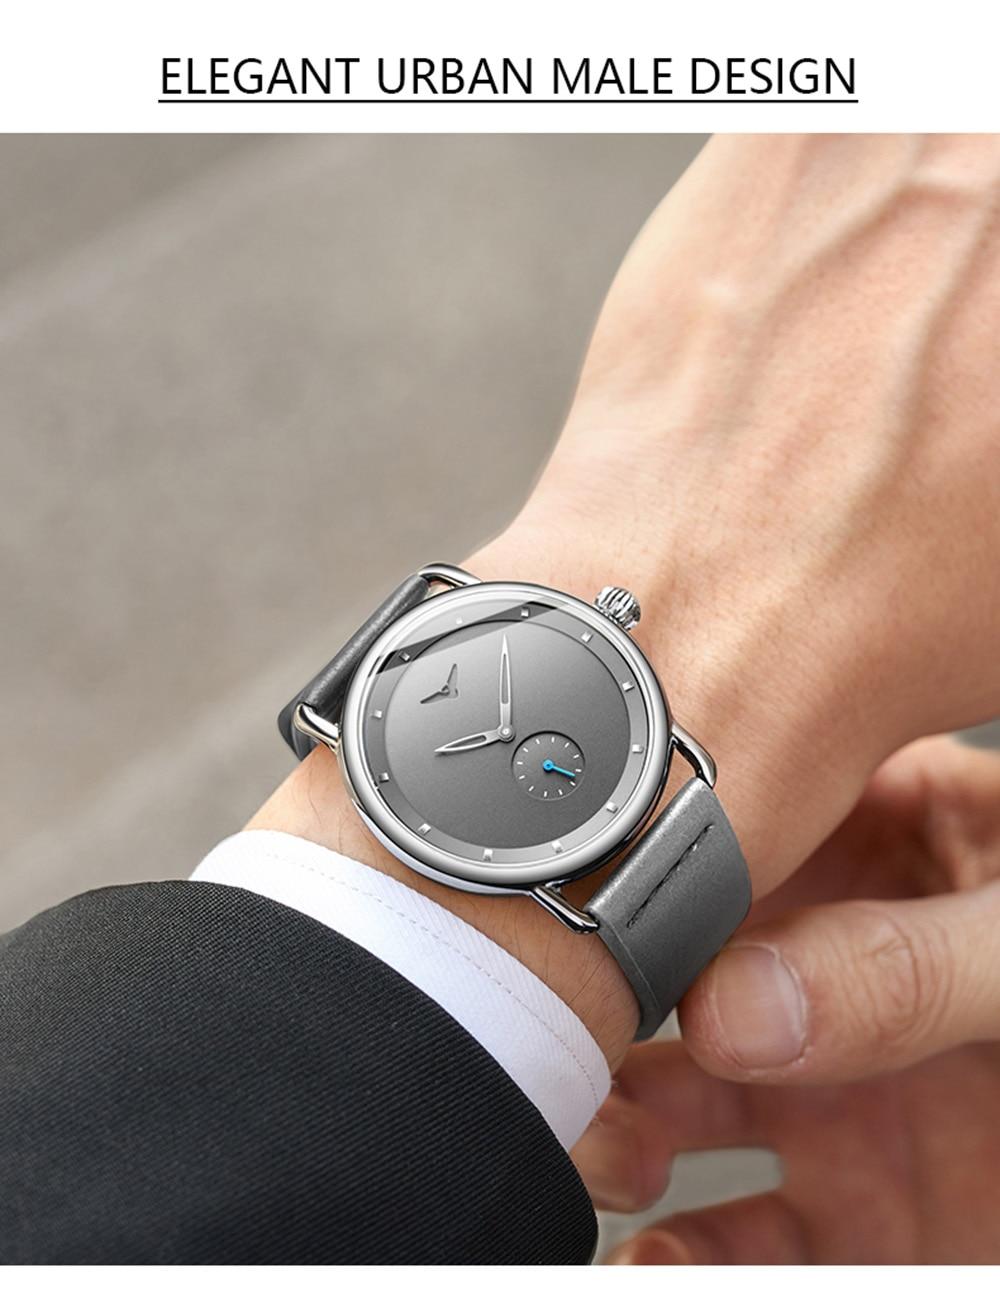 Hf7e7eff283bd41e8a55e9855ba9fb410U ONOLA top brand leather men watches clock fashion sport simple casual waterproof Wrist watch men relogio masculino